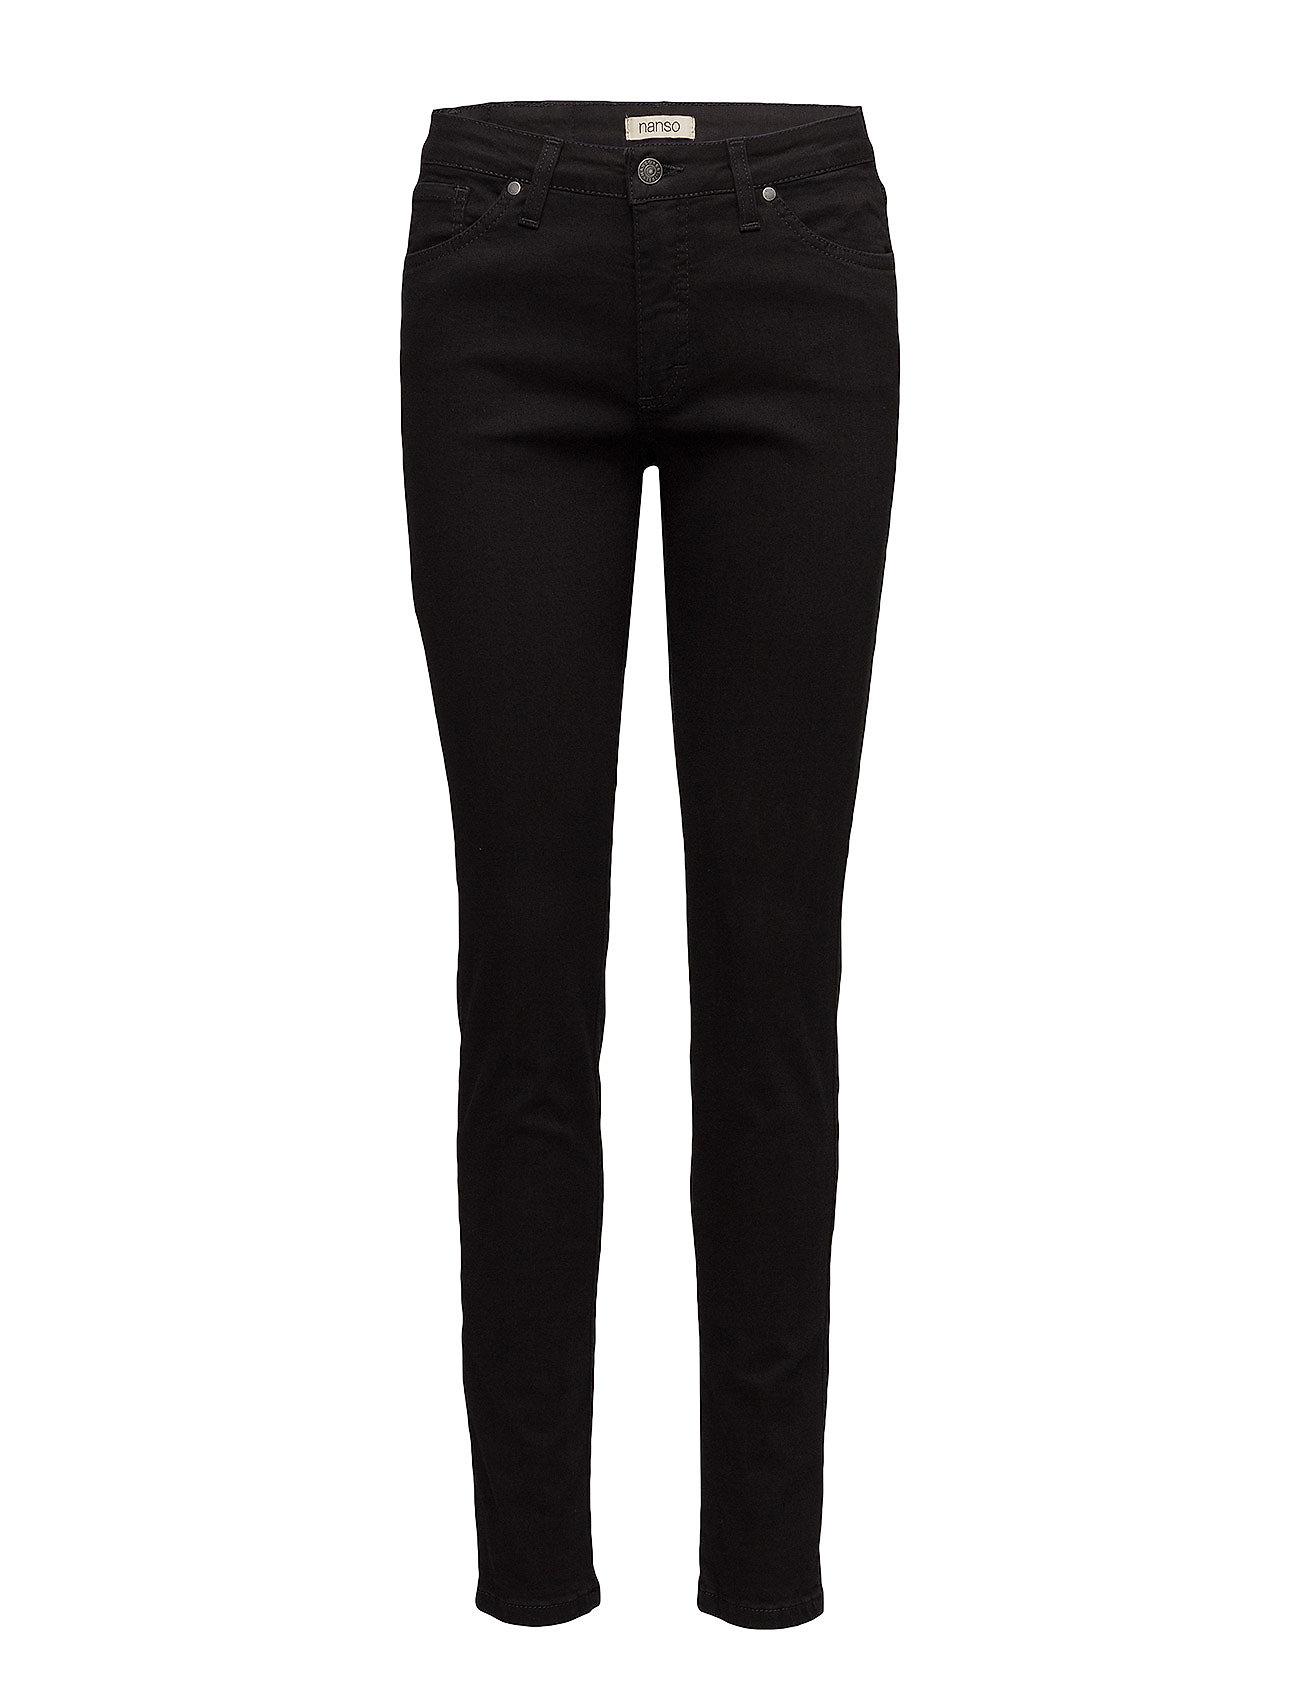 Nanso Ladies jeans, Viistasku - BLACK